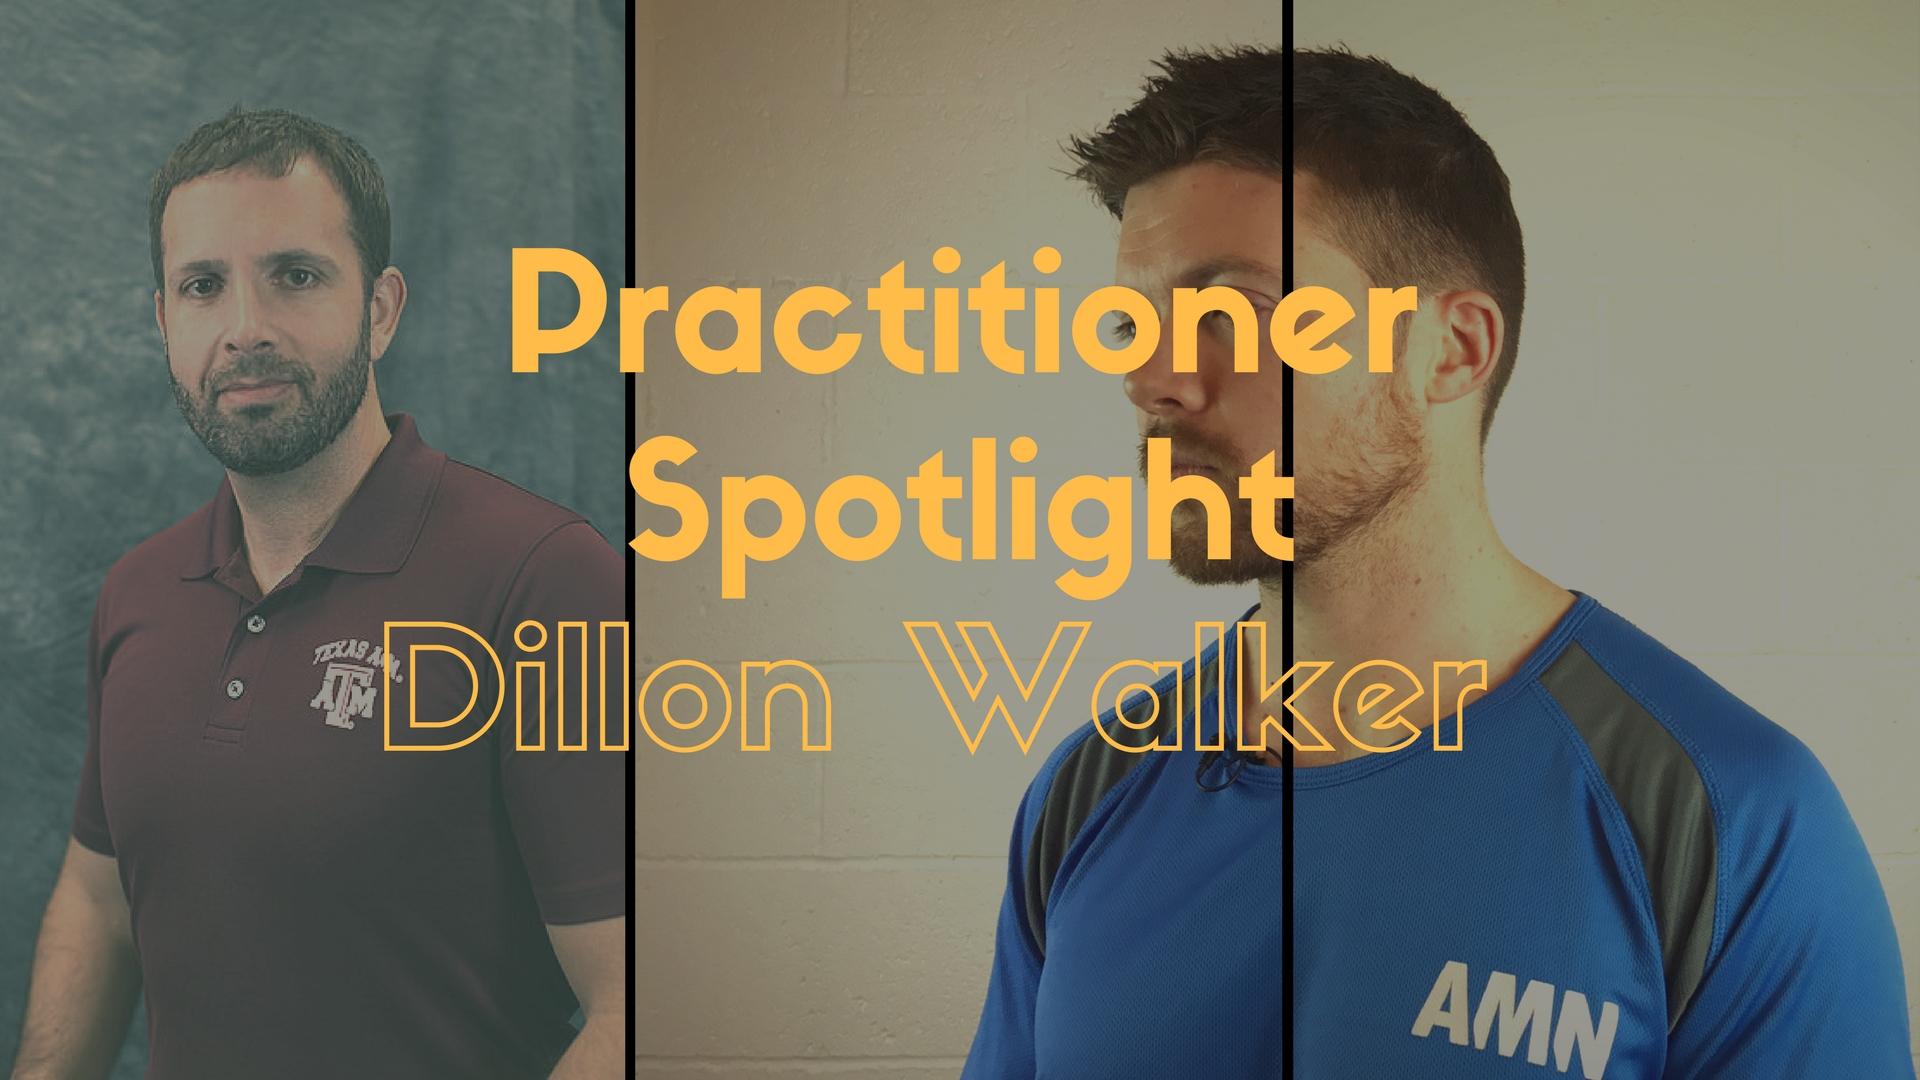 dillon-walker-practitioner-spotlight